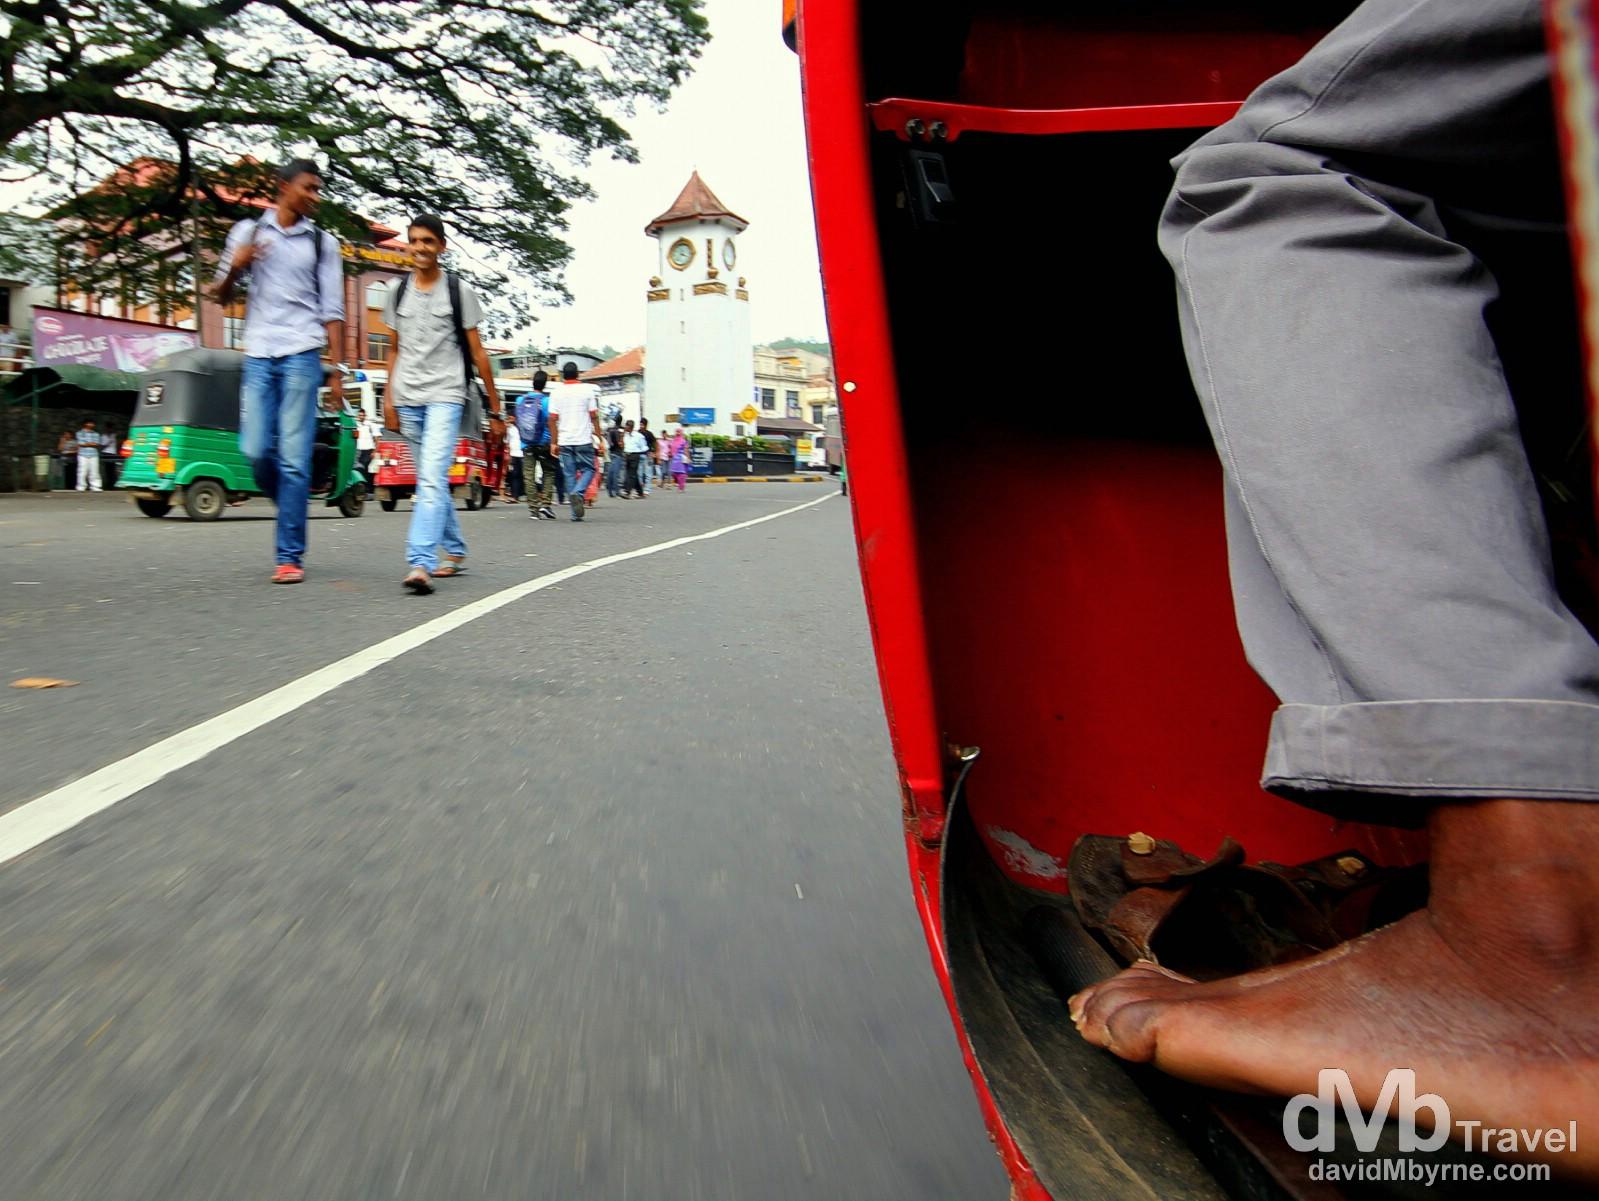 Riding a tuk-tuk on the streets of Kandy, Sri Lanka. September 9th 2012.